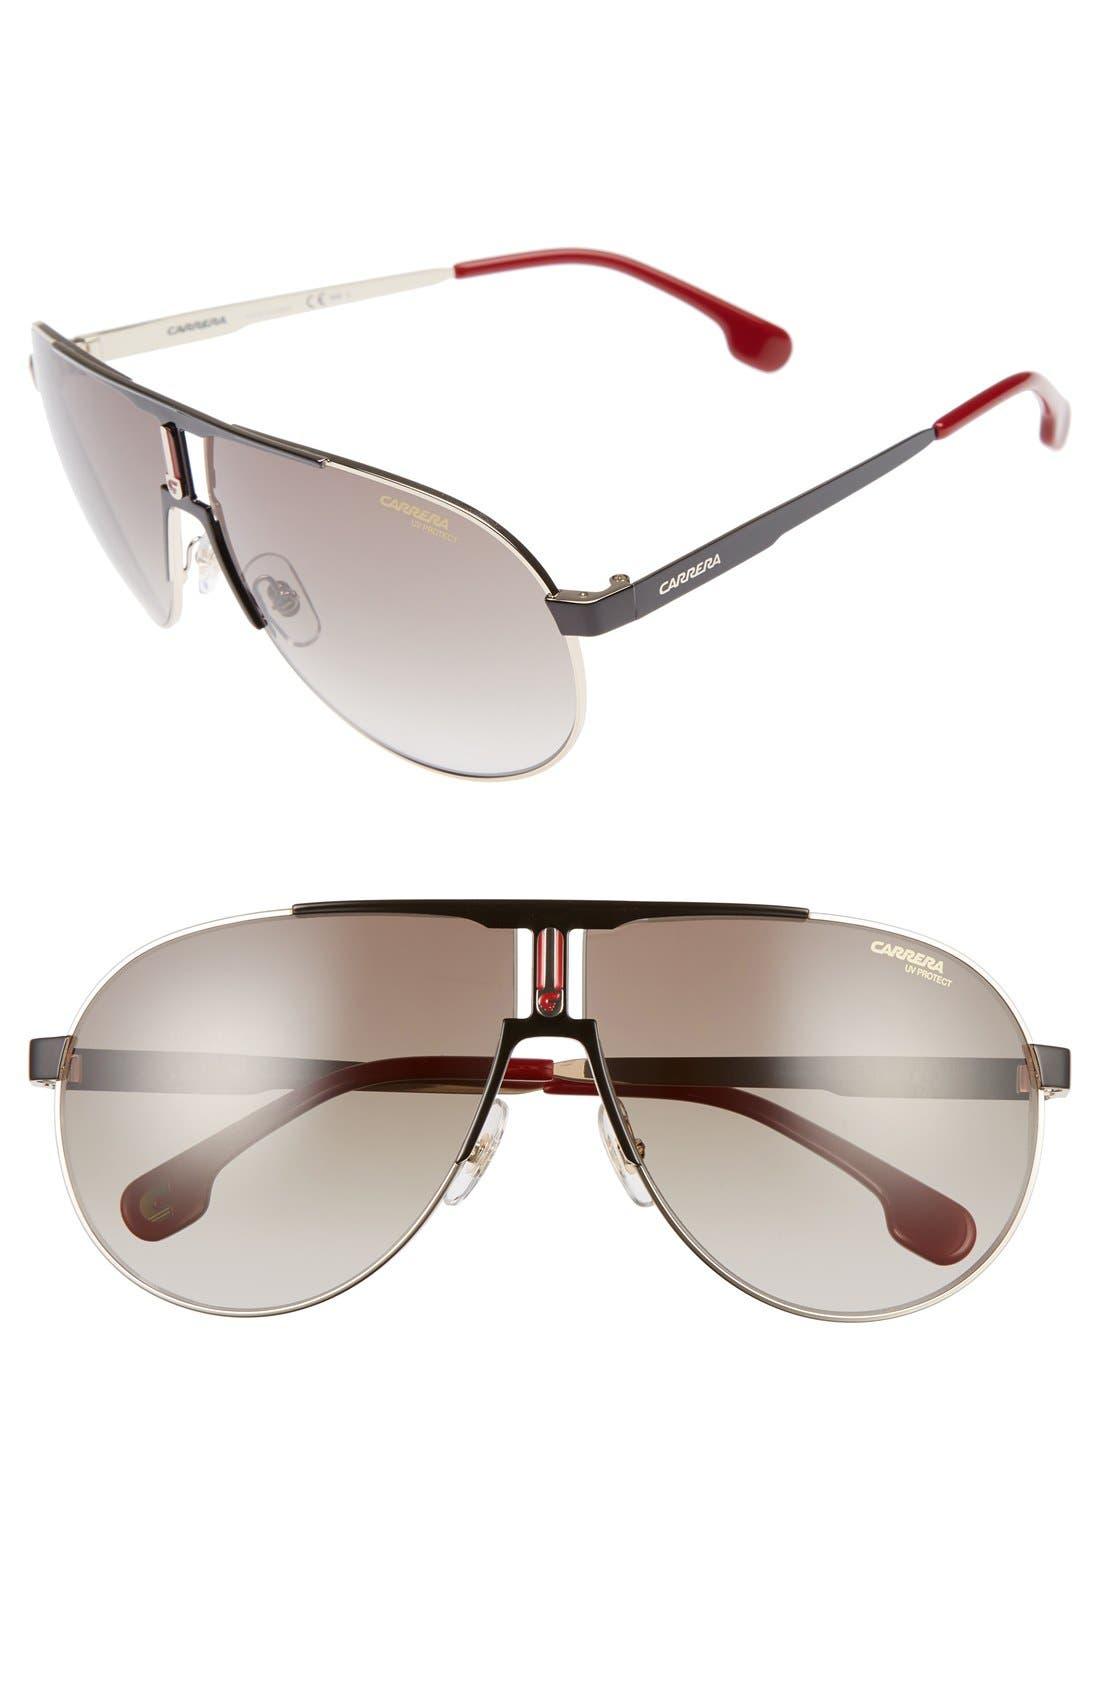 66mm Aviator Sunglasses,                             Main thumbnail 1, color,                             Black Gold